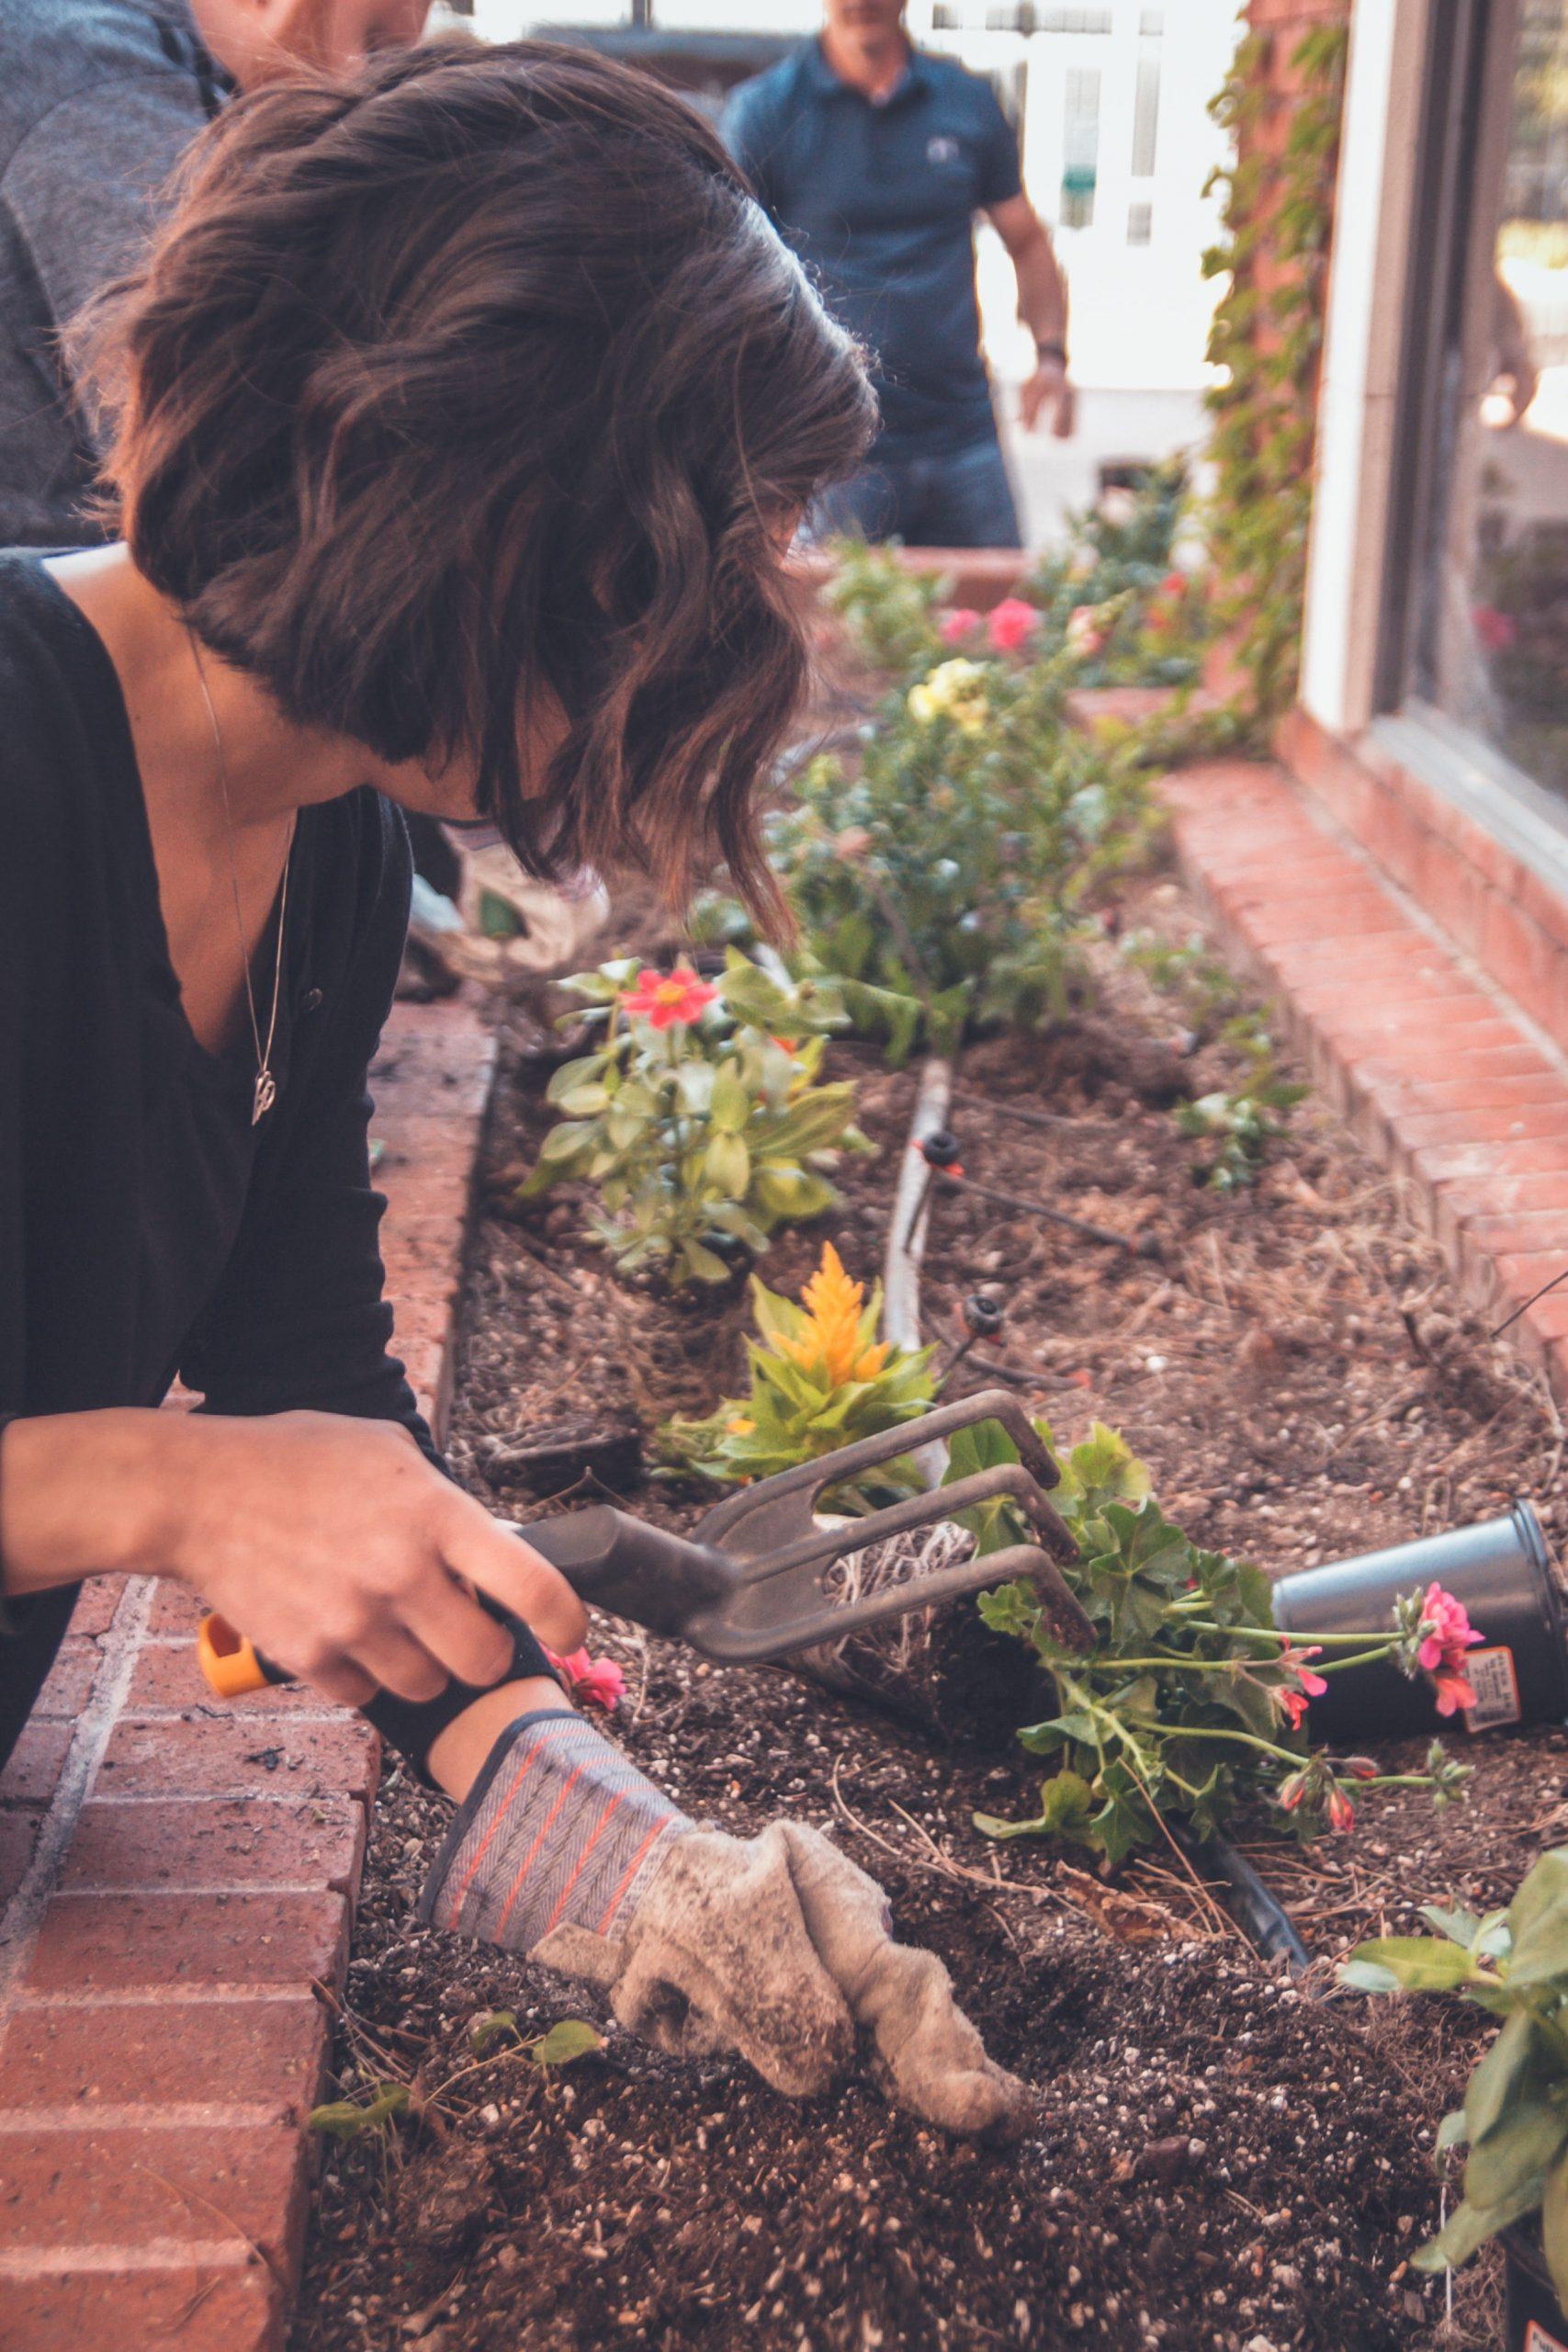 Gardening Tips for Older People